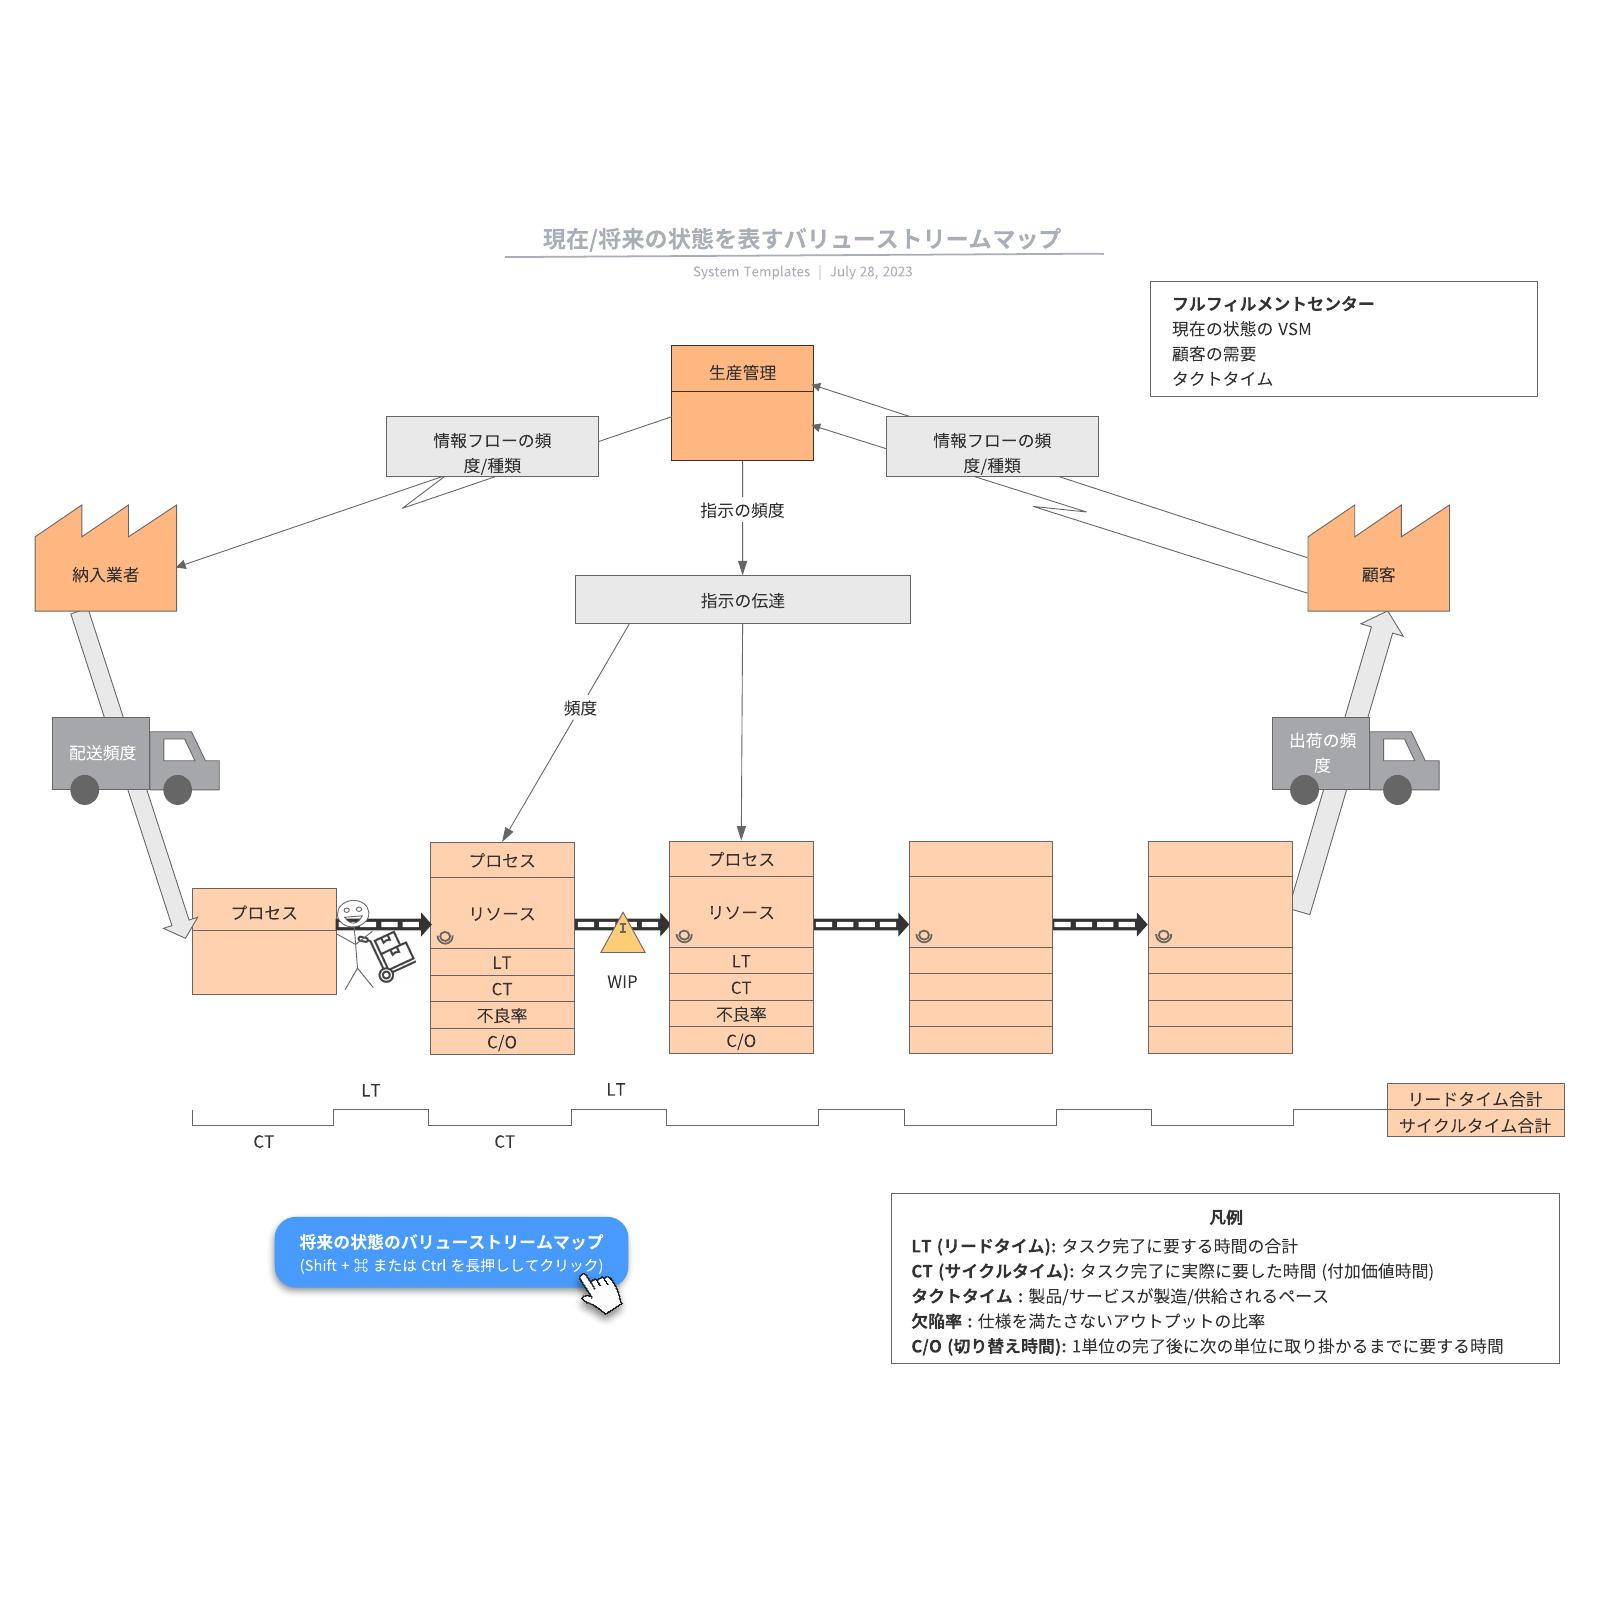 VSMバリューストリームマップに使える参考例